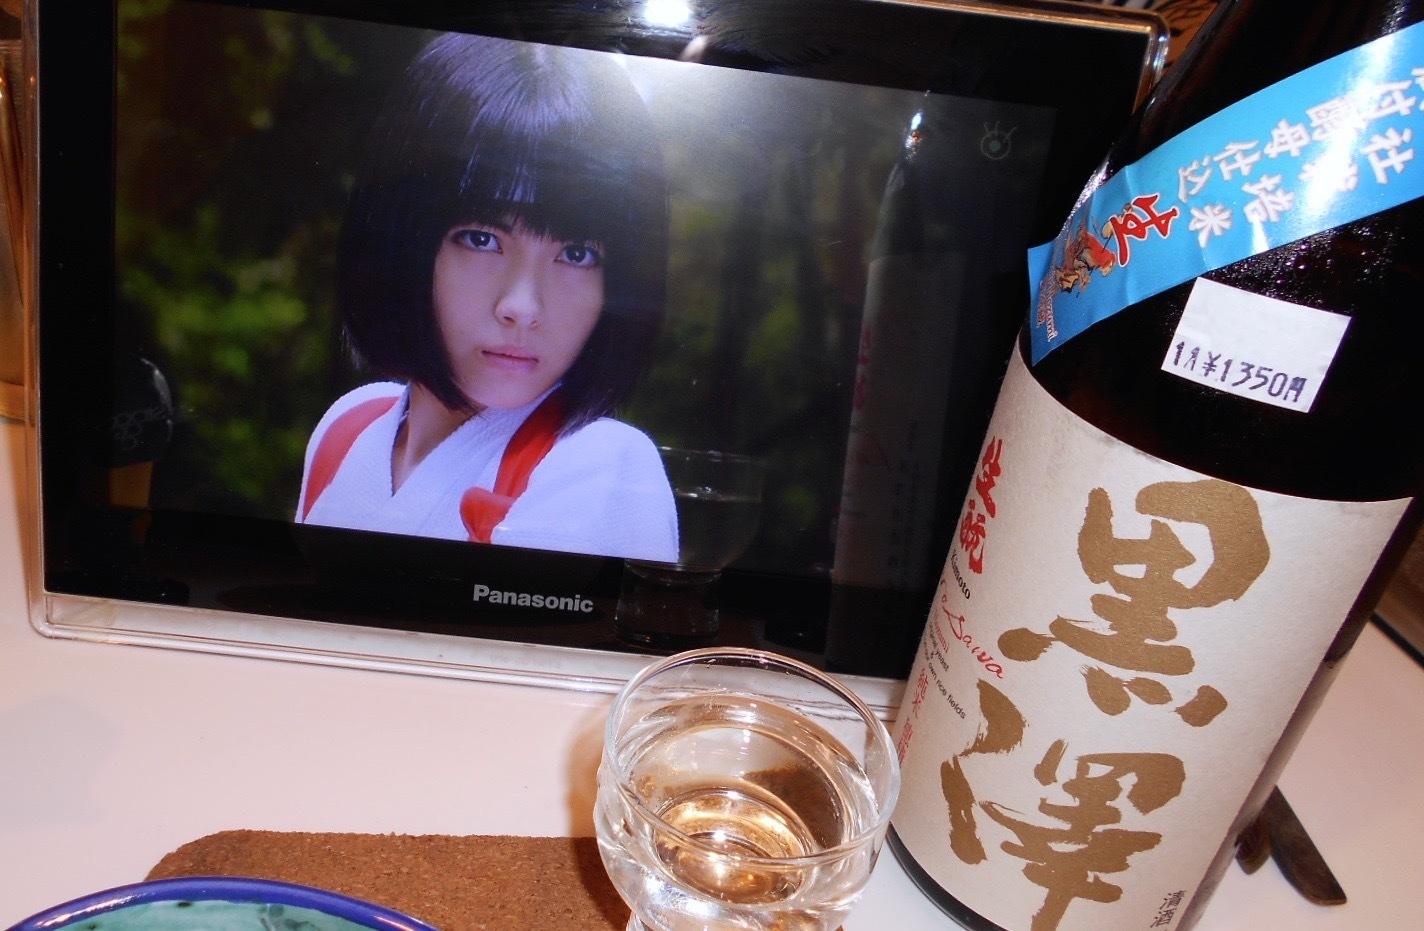 kurosawa_hozumi30by1_4.jpg